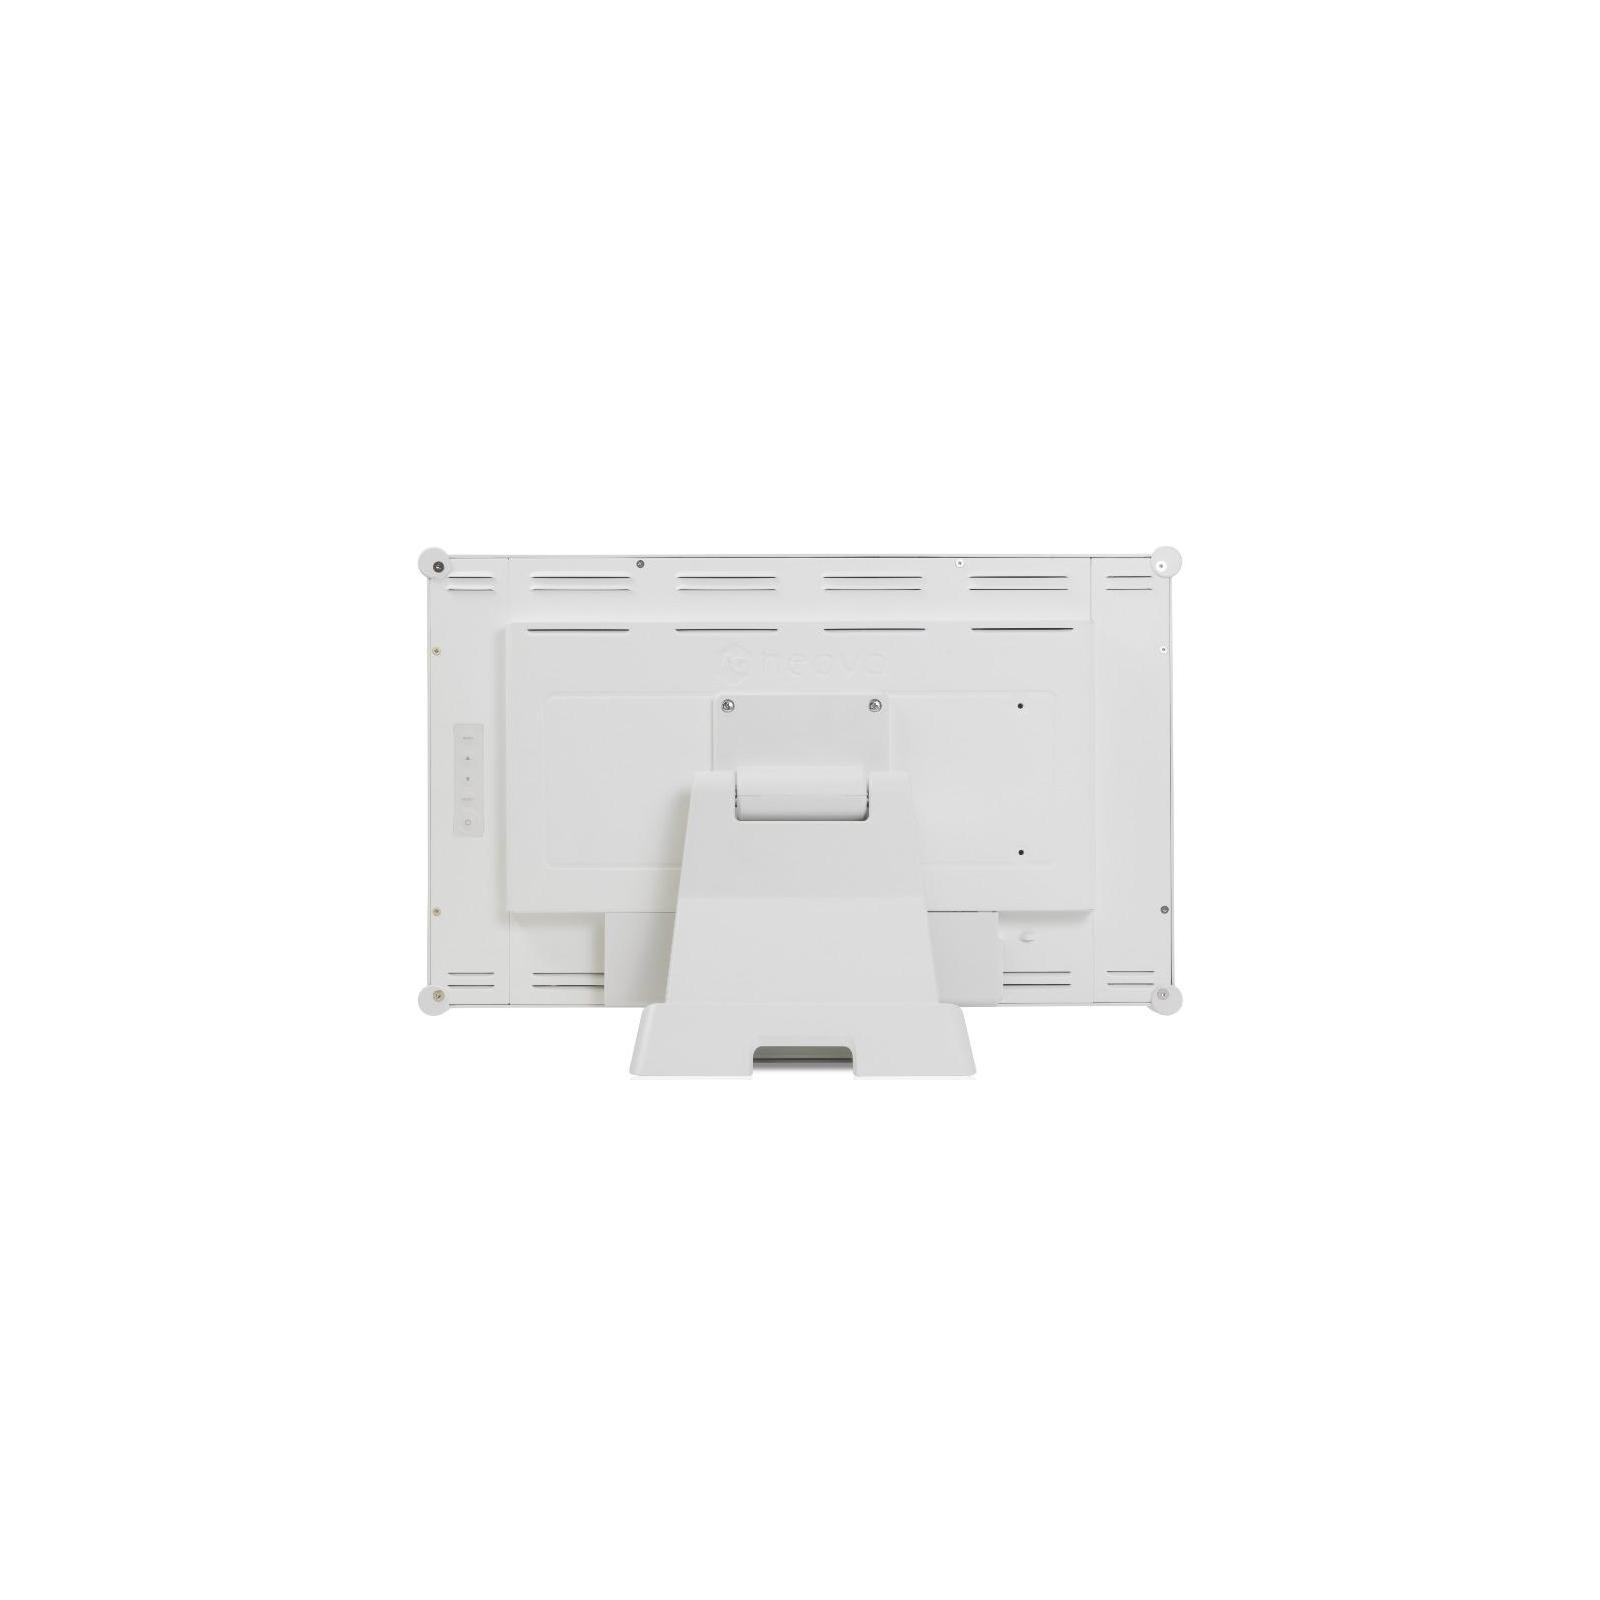 Монитор Neovo TX-22 WHITE изображение 3